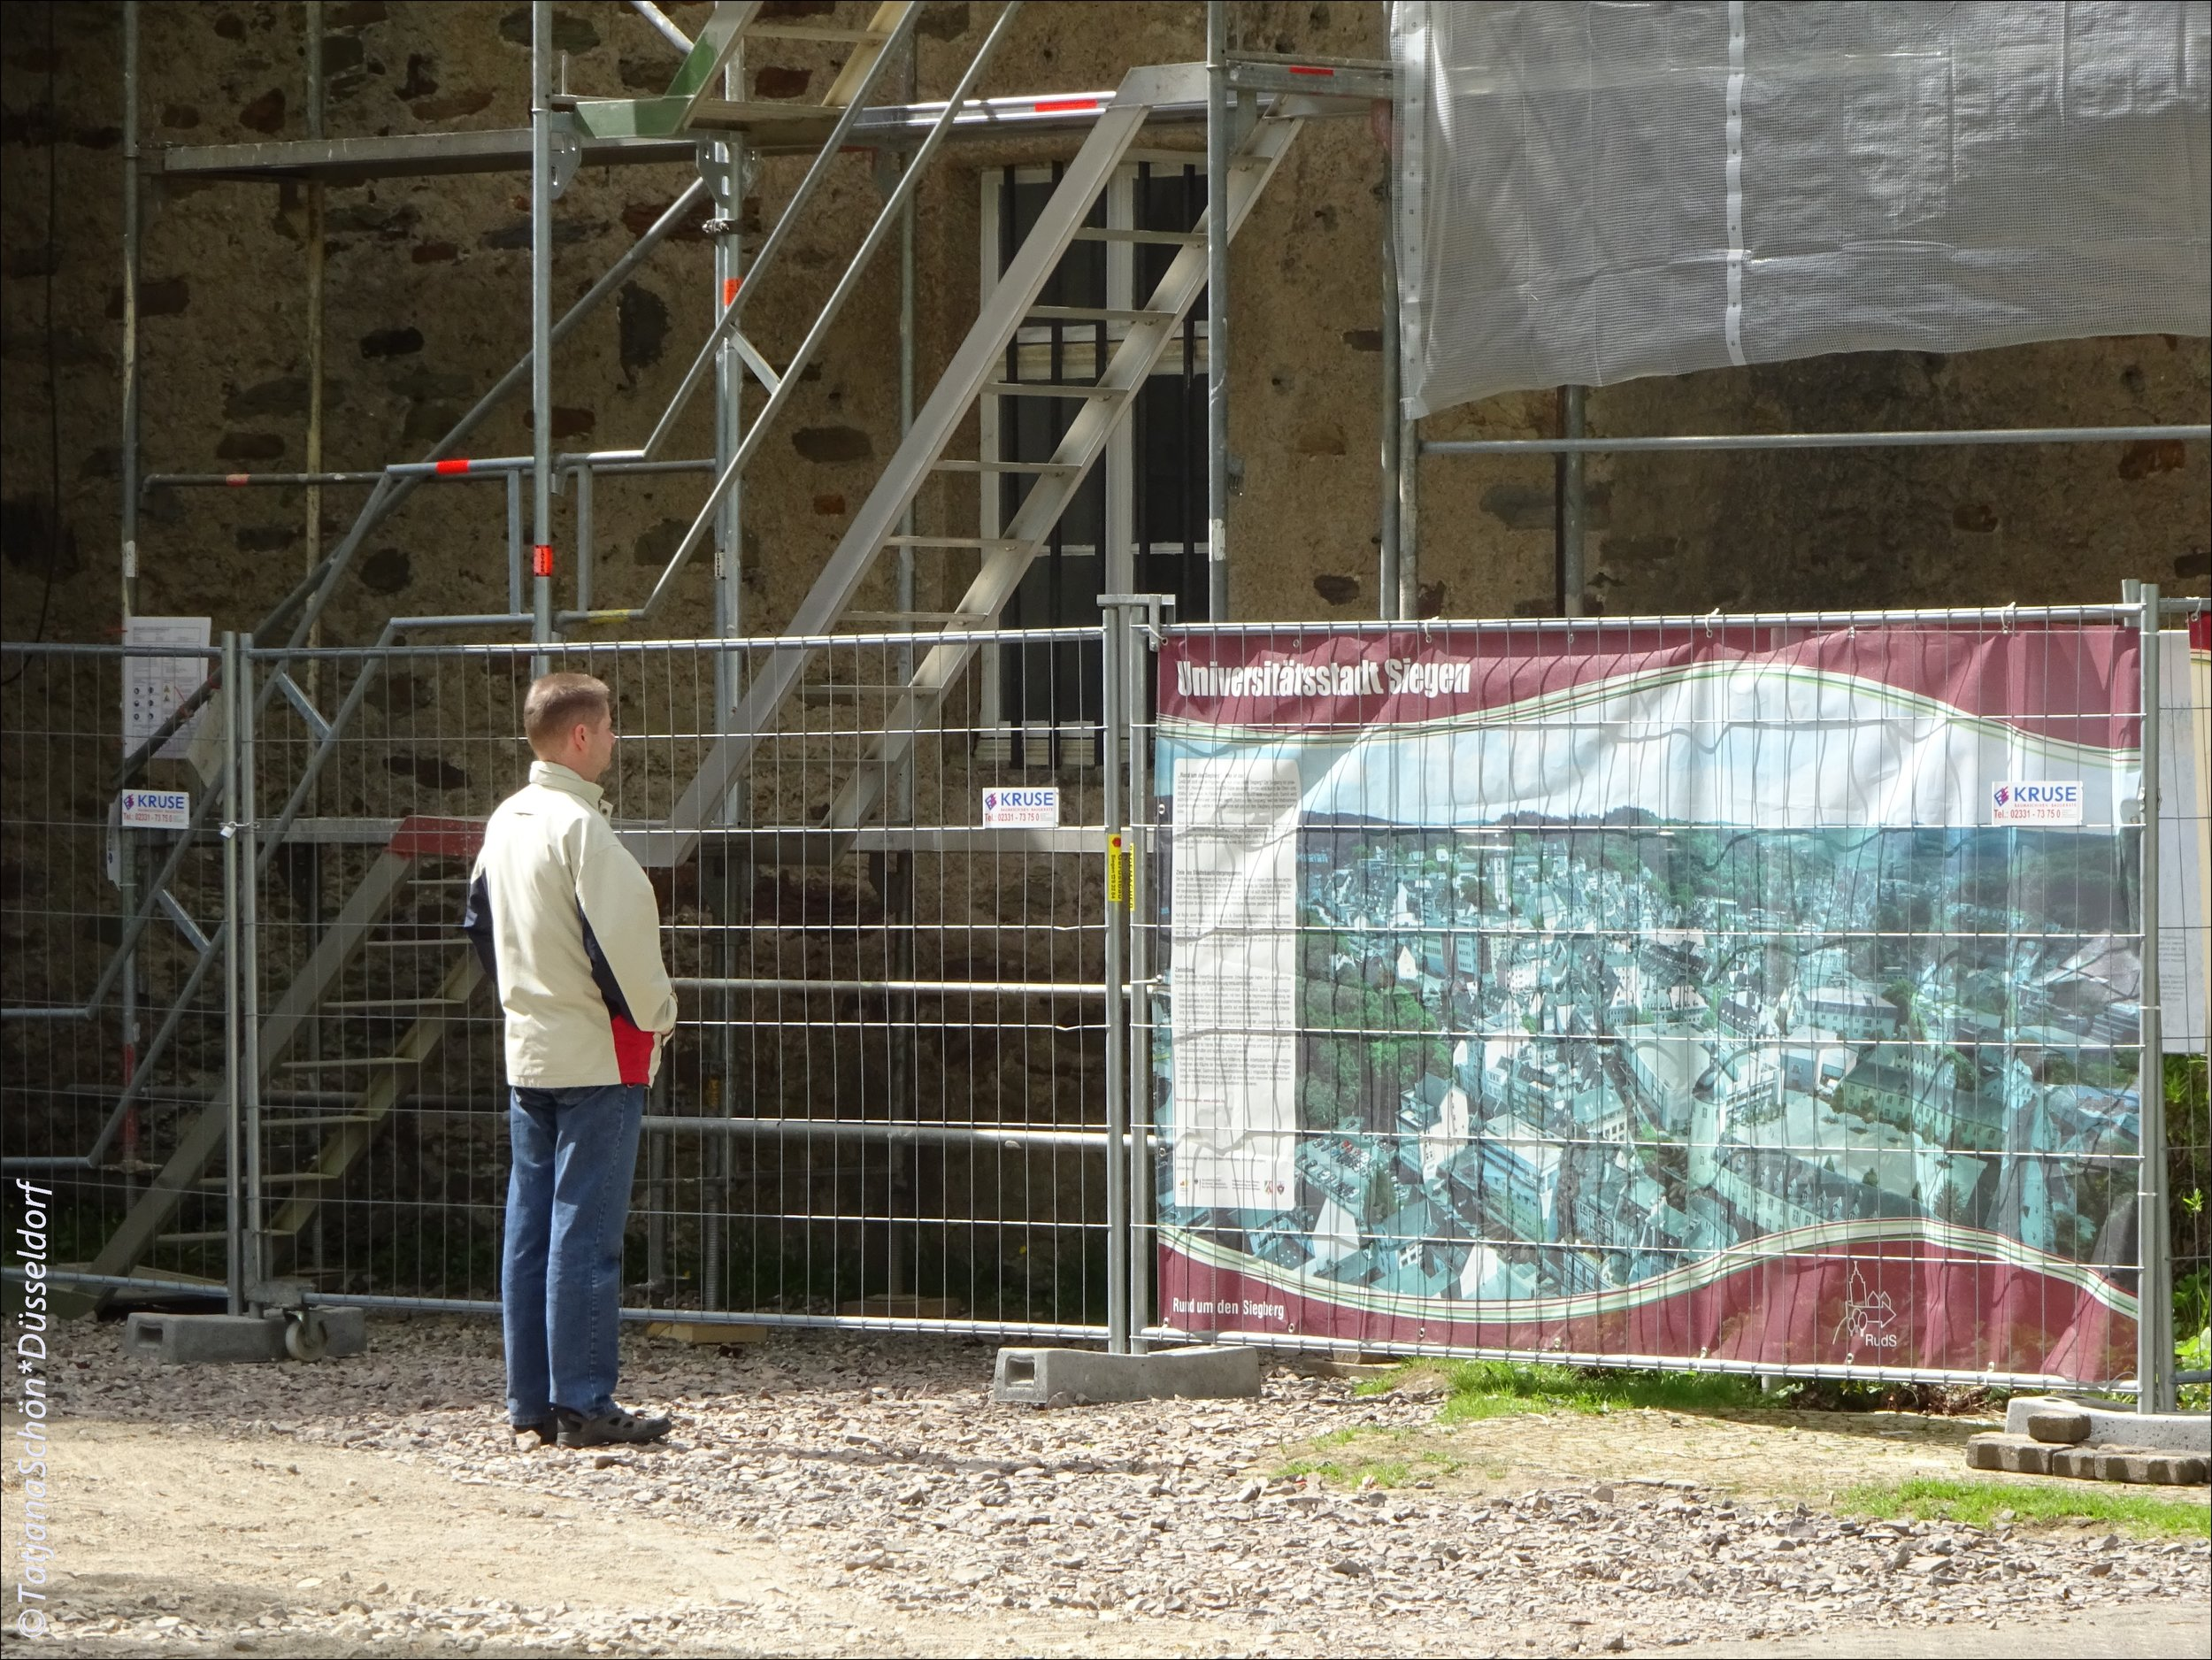 Siegen-natur63-2018.JPG